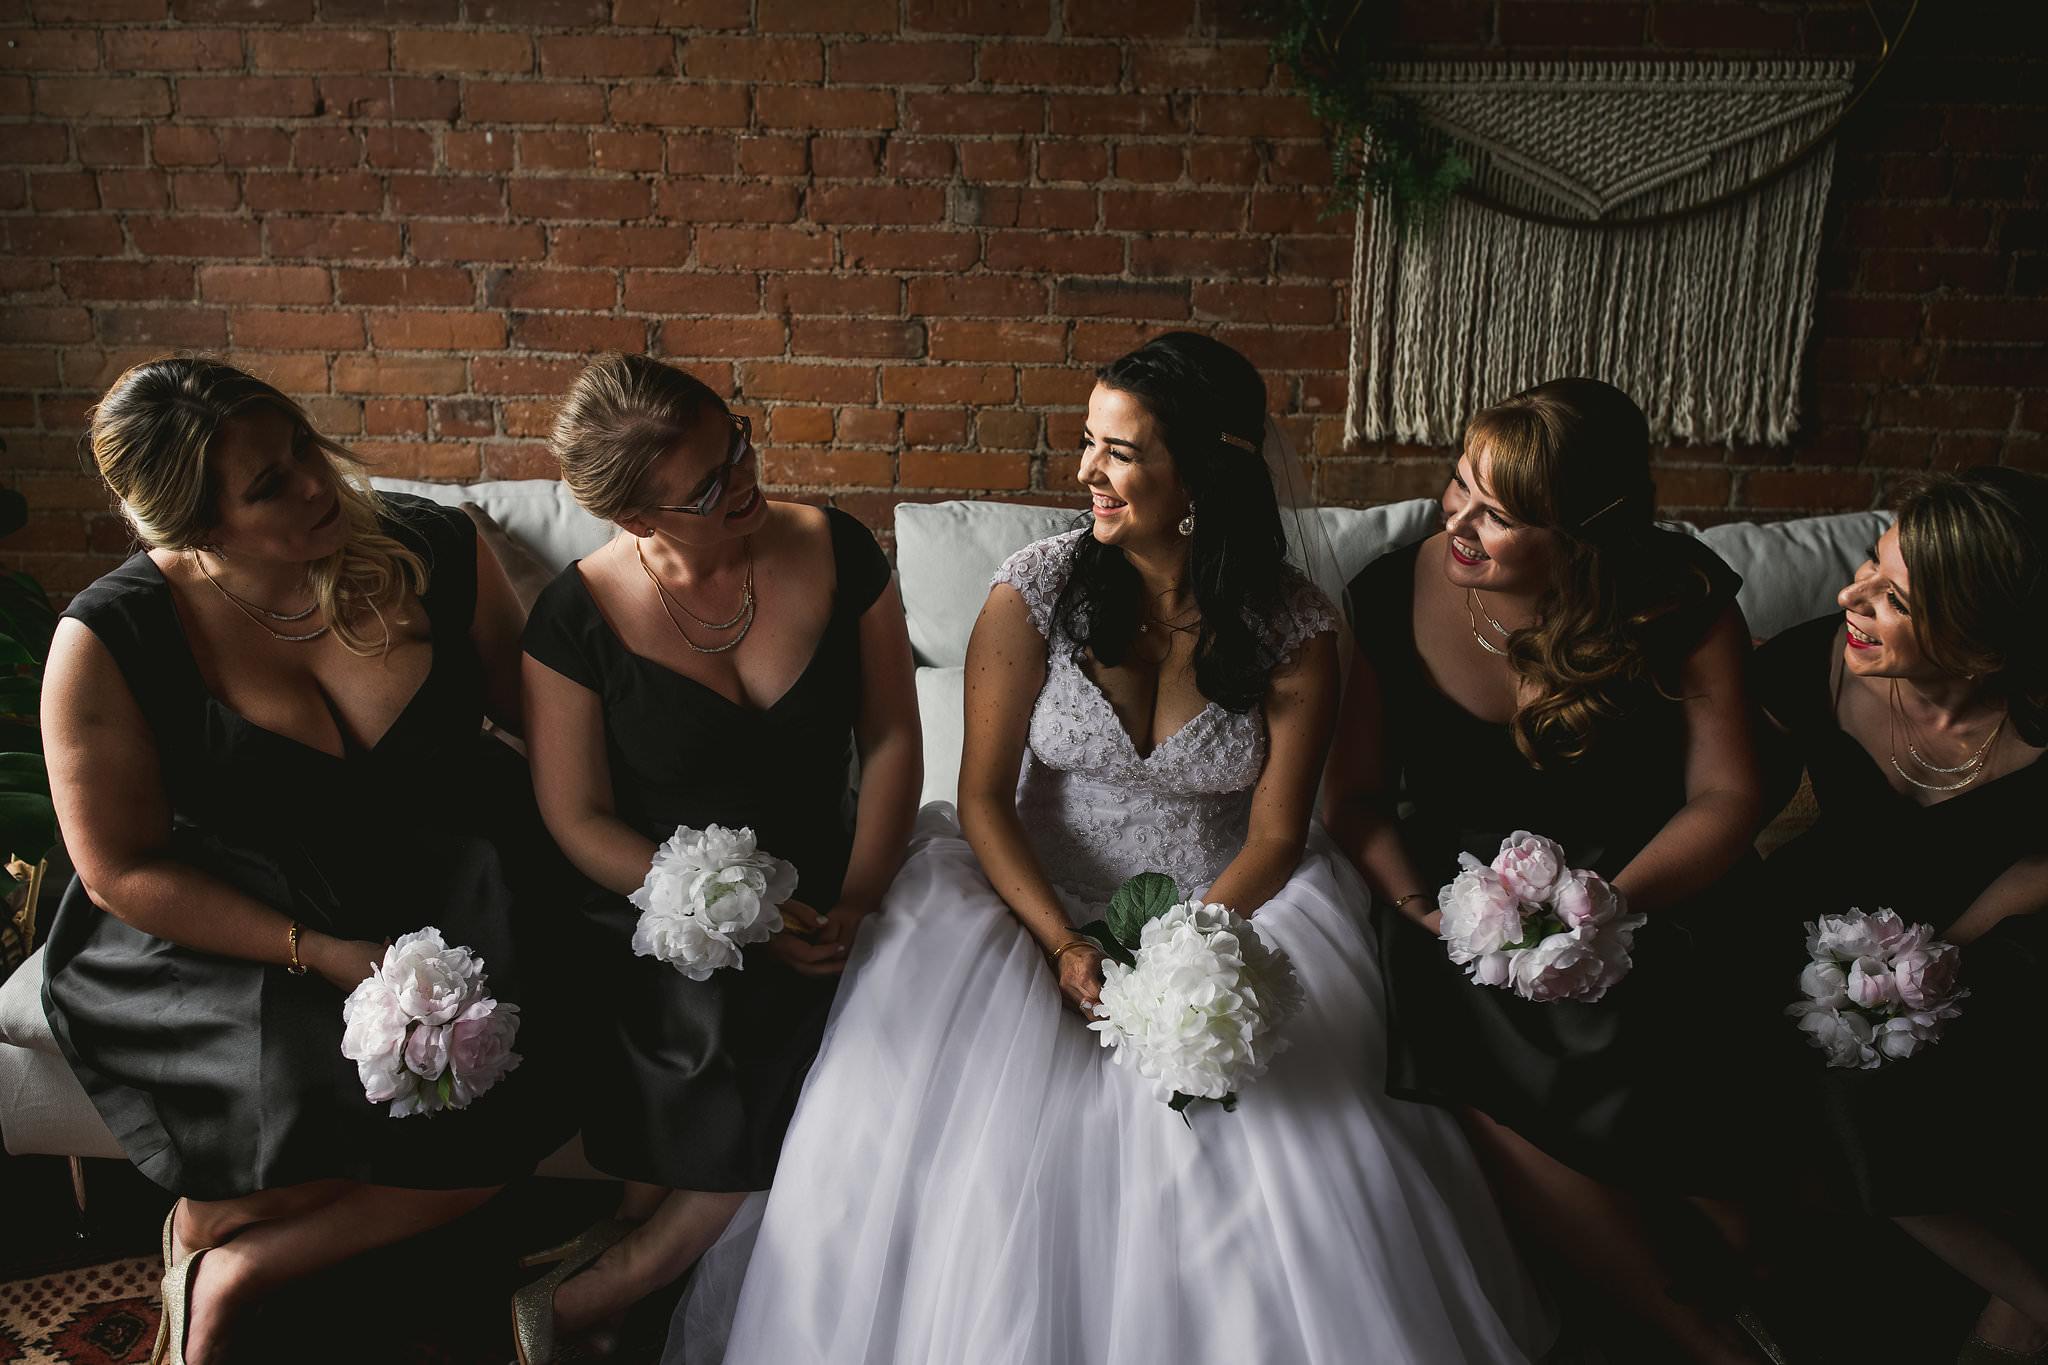 Kristen Adam Kindred Loft Whitby Wedding Photos 207 - Durham Wedding Photographer: Kindred Loft Wedding Photos